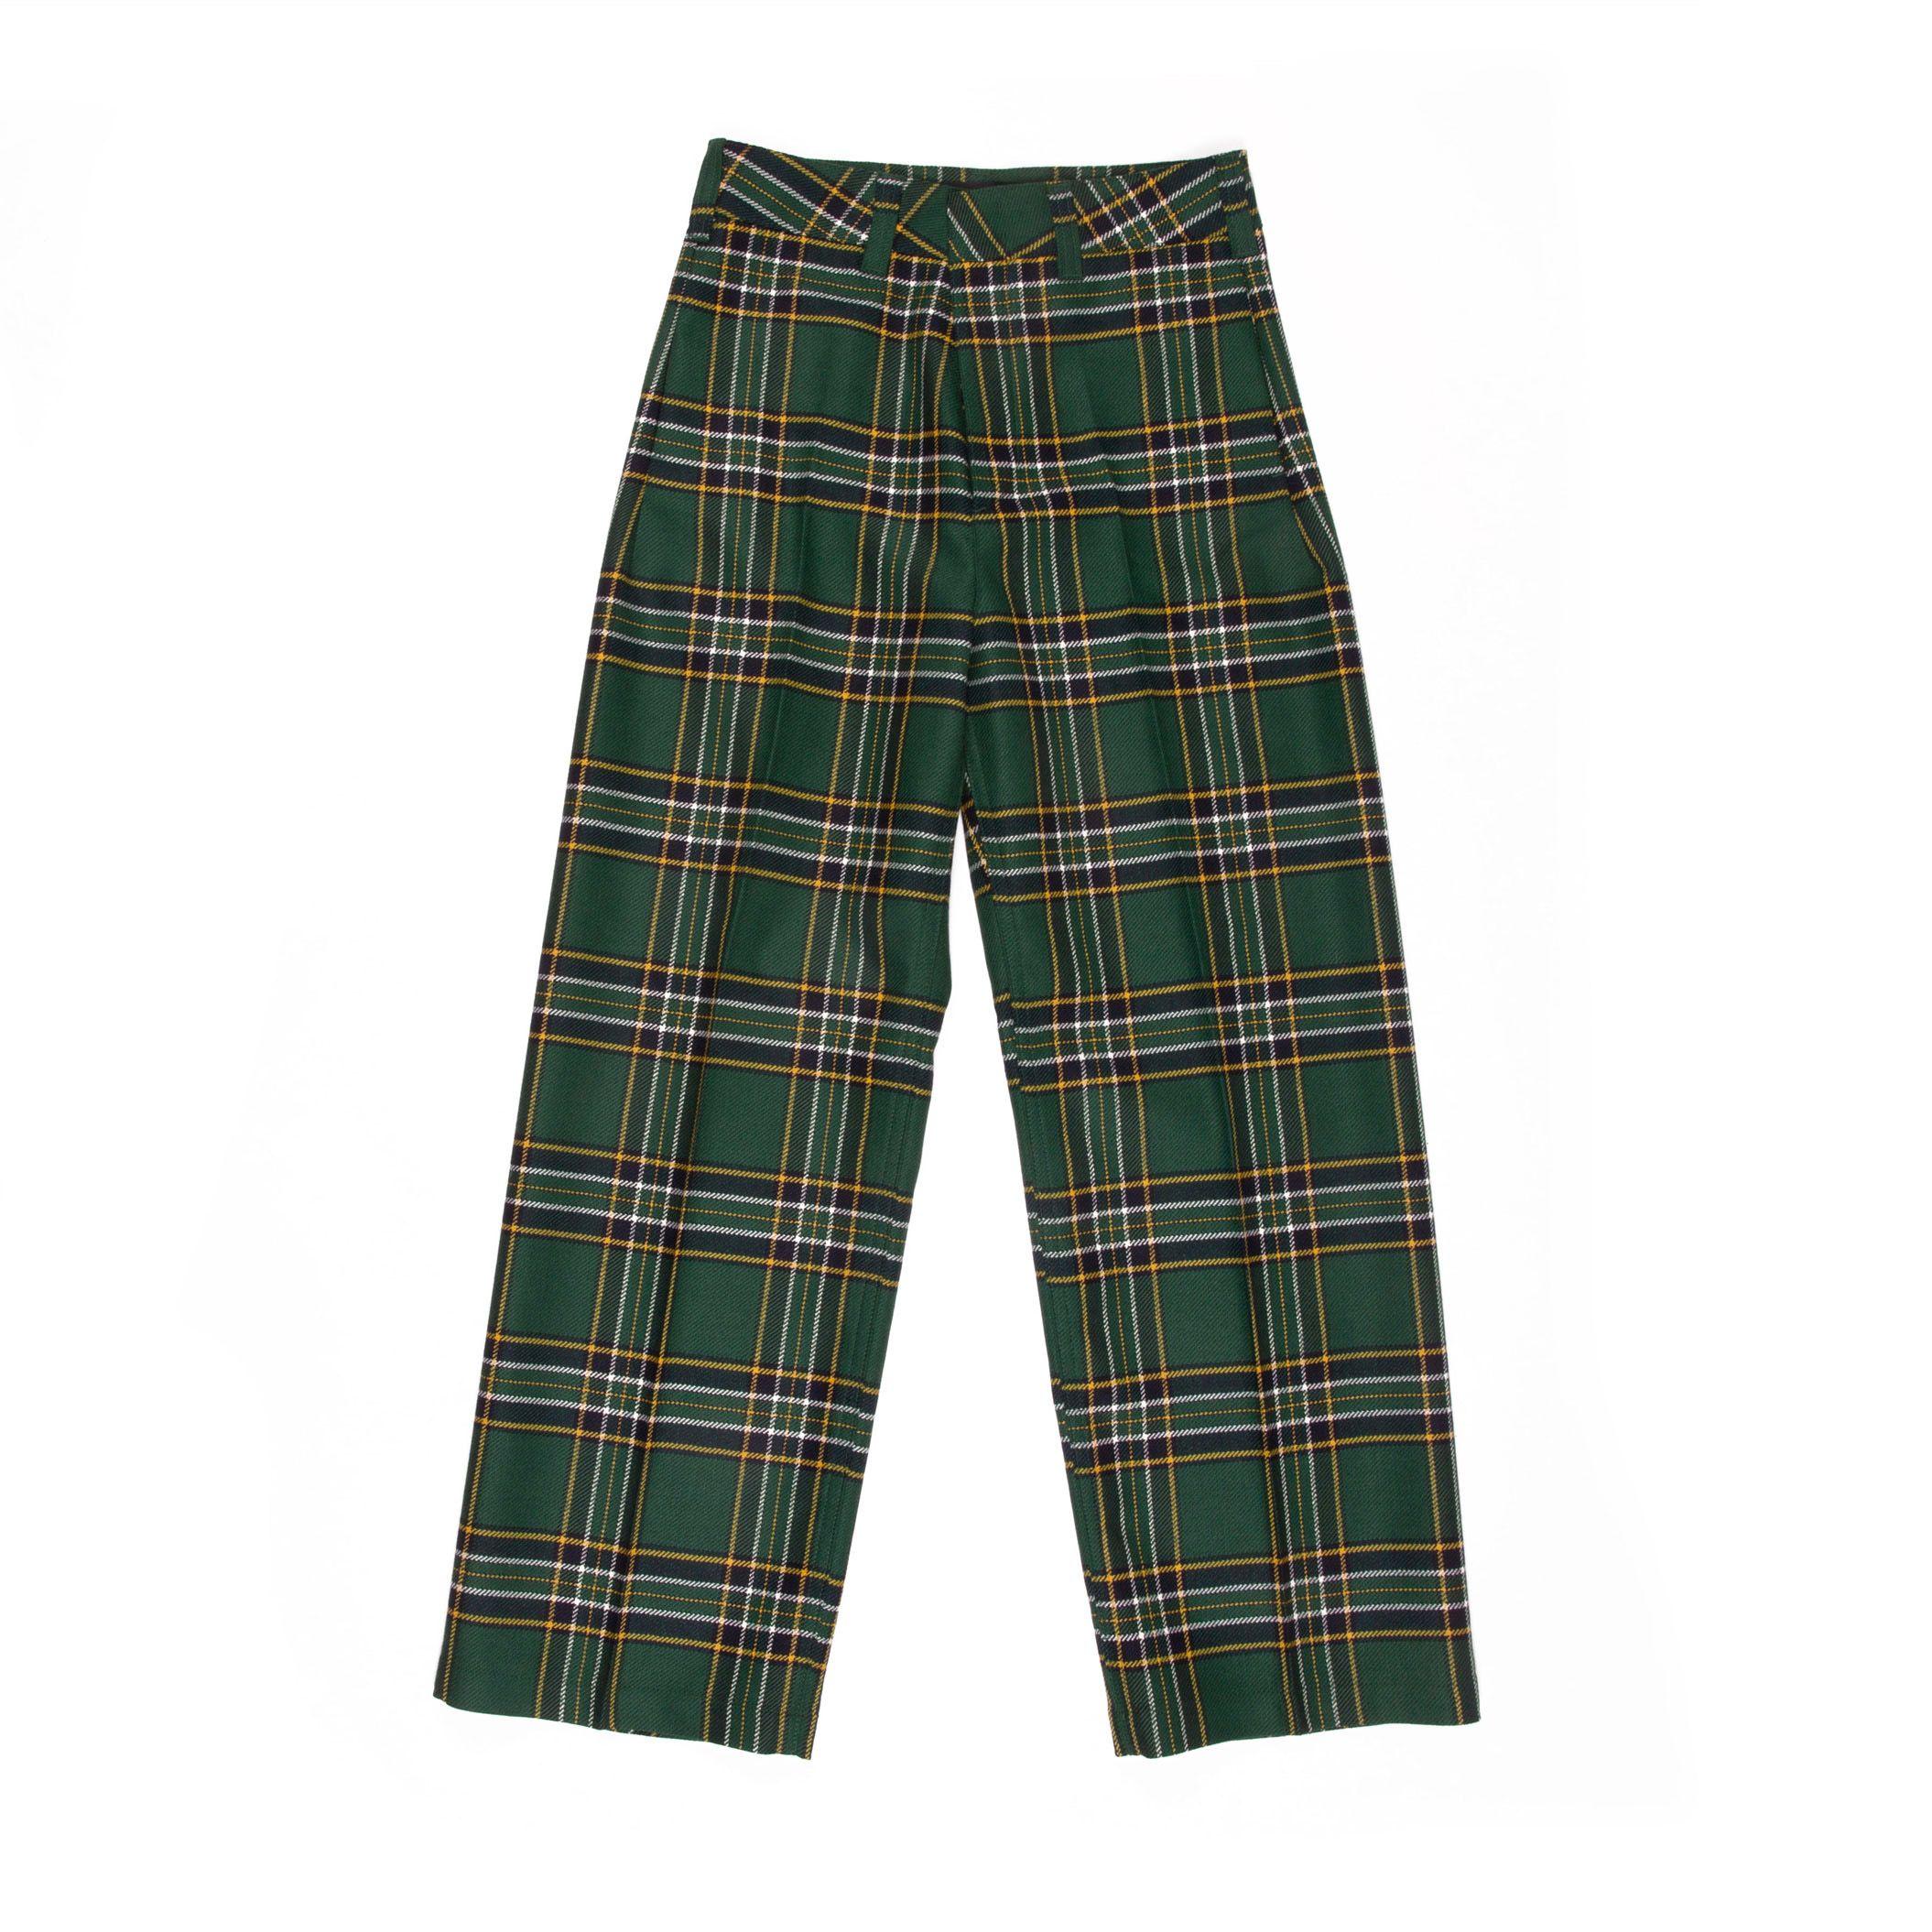 department 5 due tartan mujer pantalones D19P51